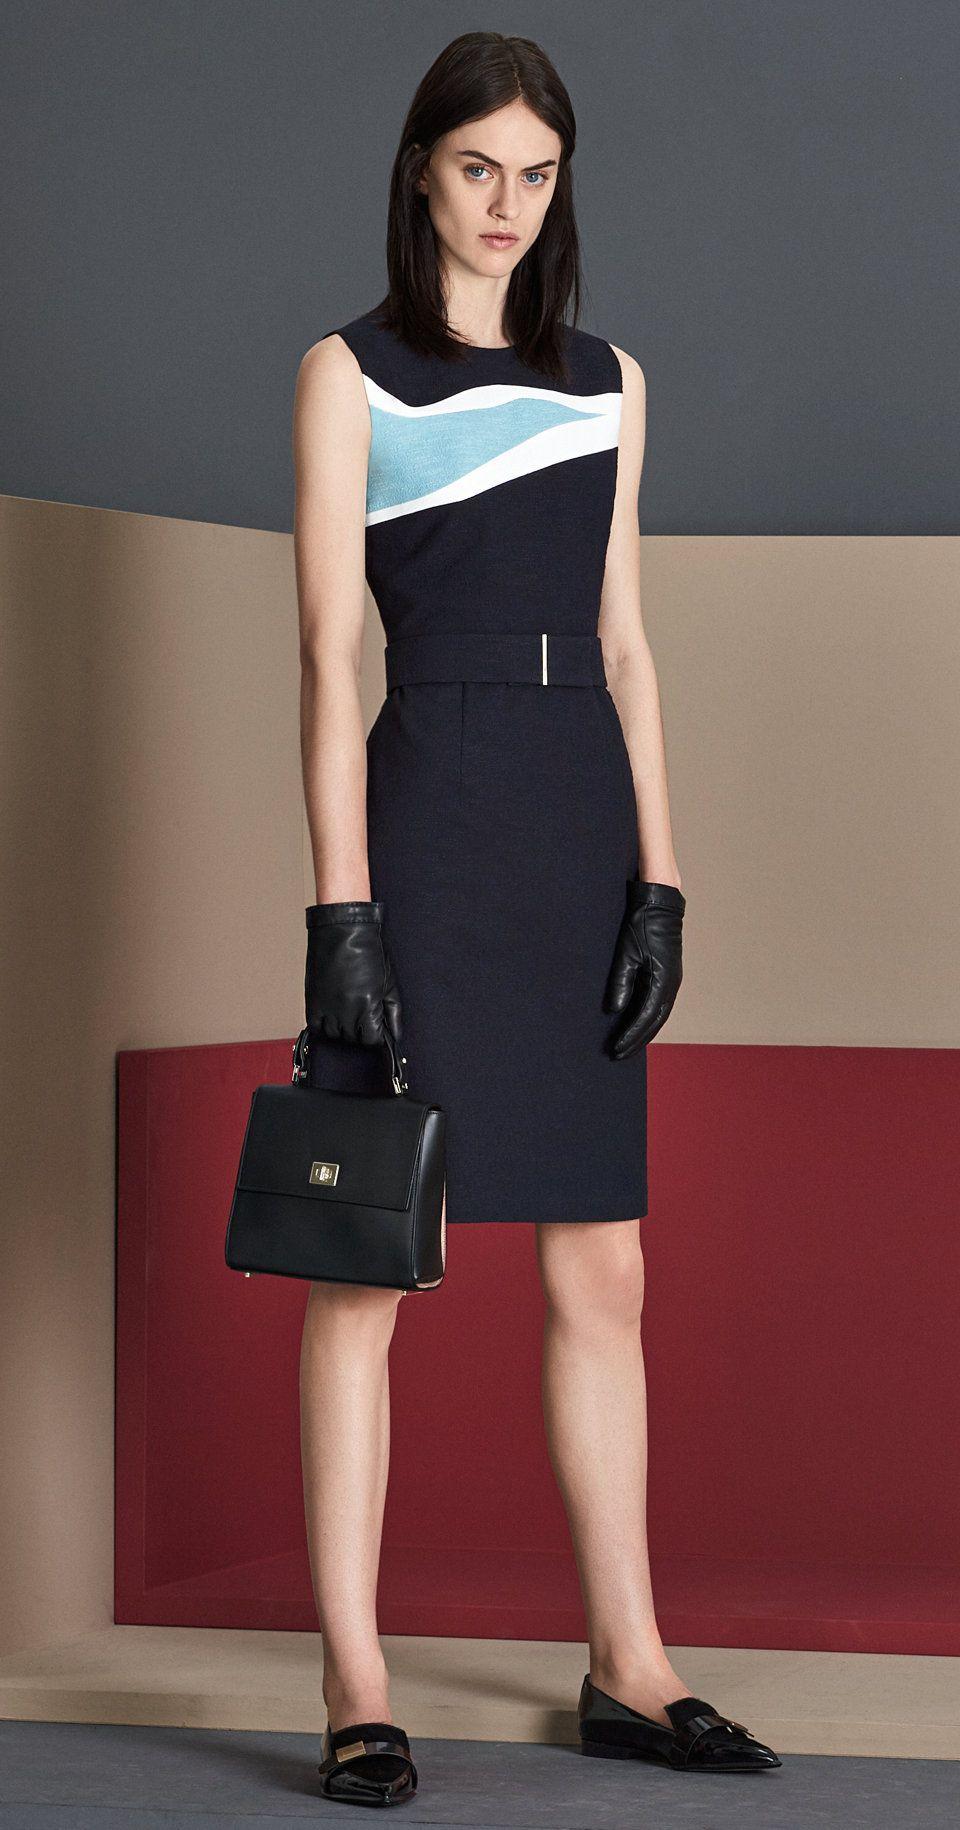 Black dress gloves - Black Dress Gloves Bag And Shoes By Boss